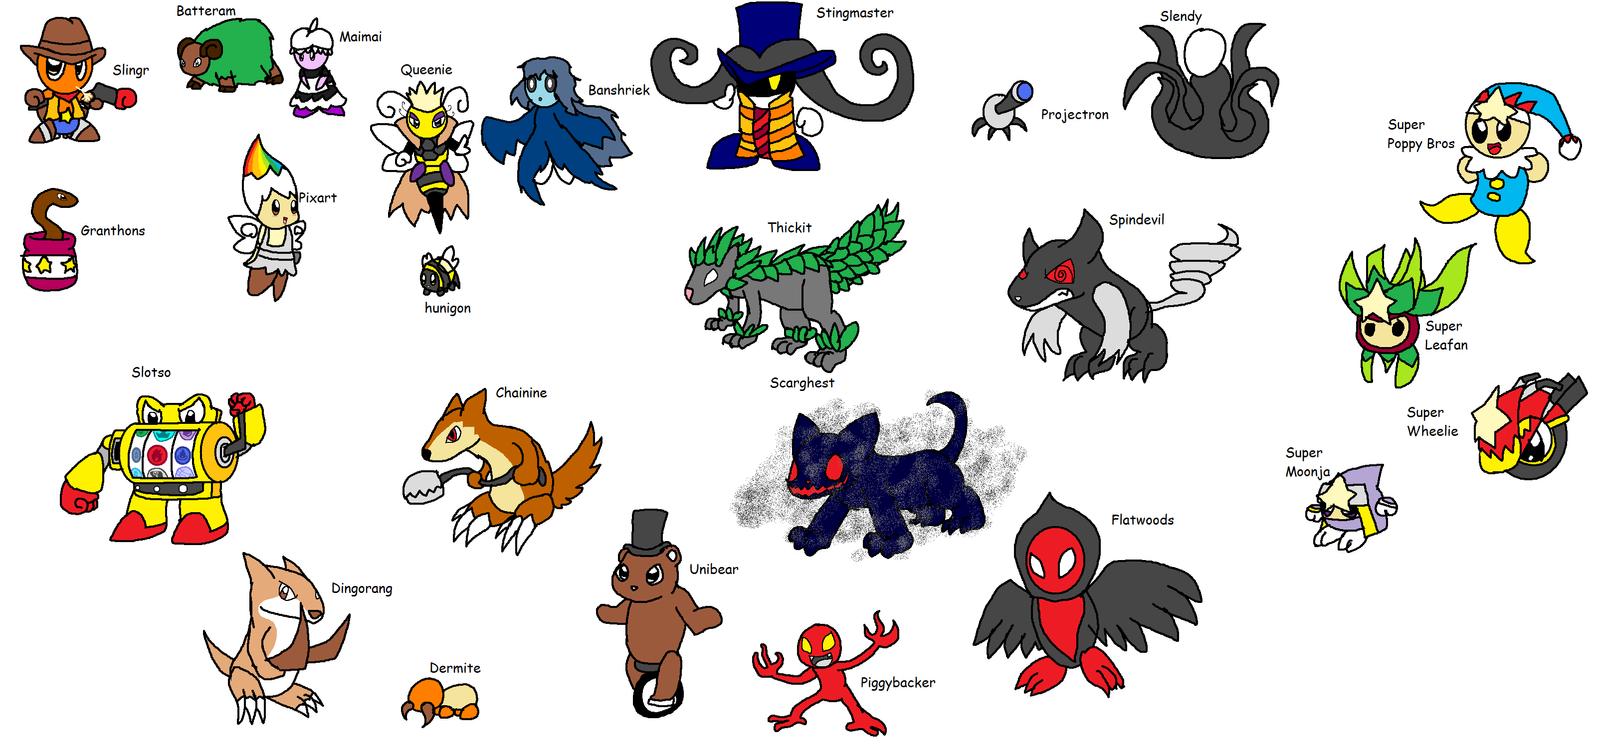 New Kirby Enemies 4 By Yingyangheart On Deviantart